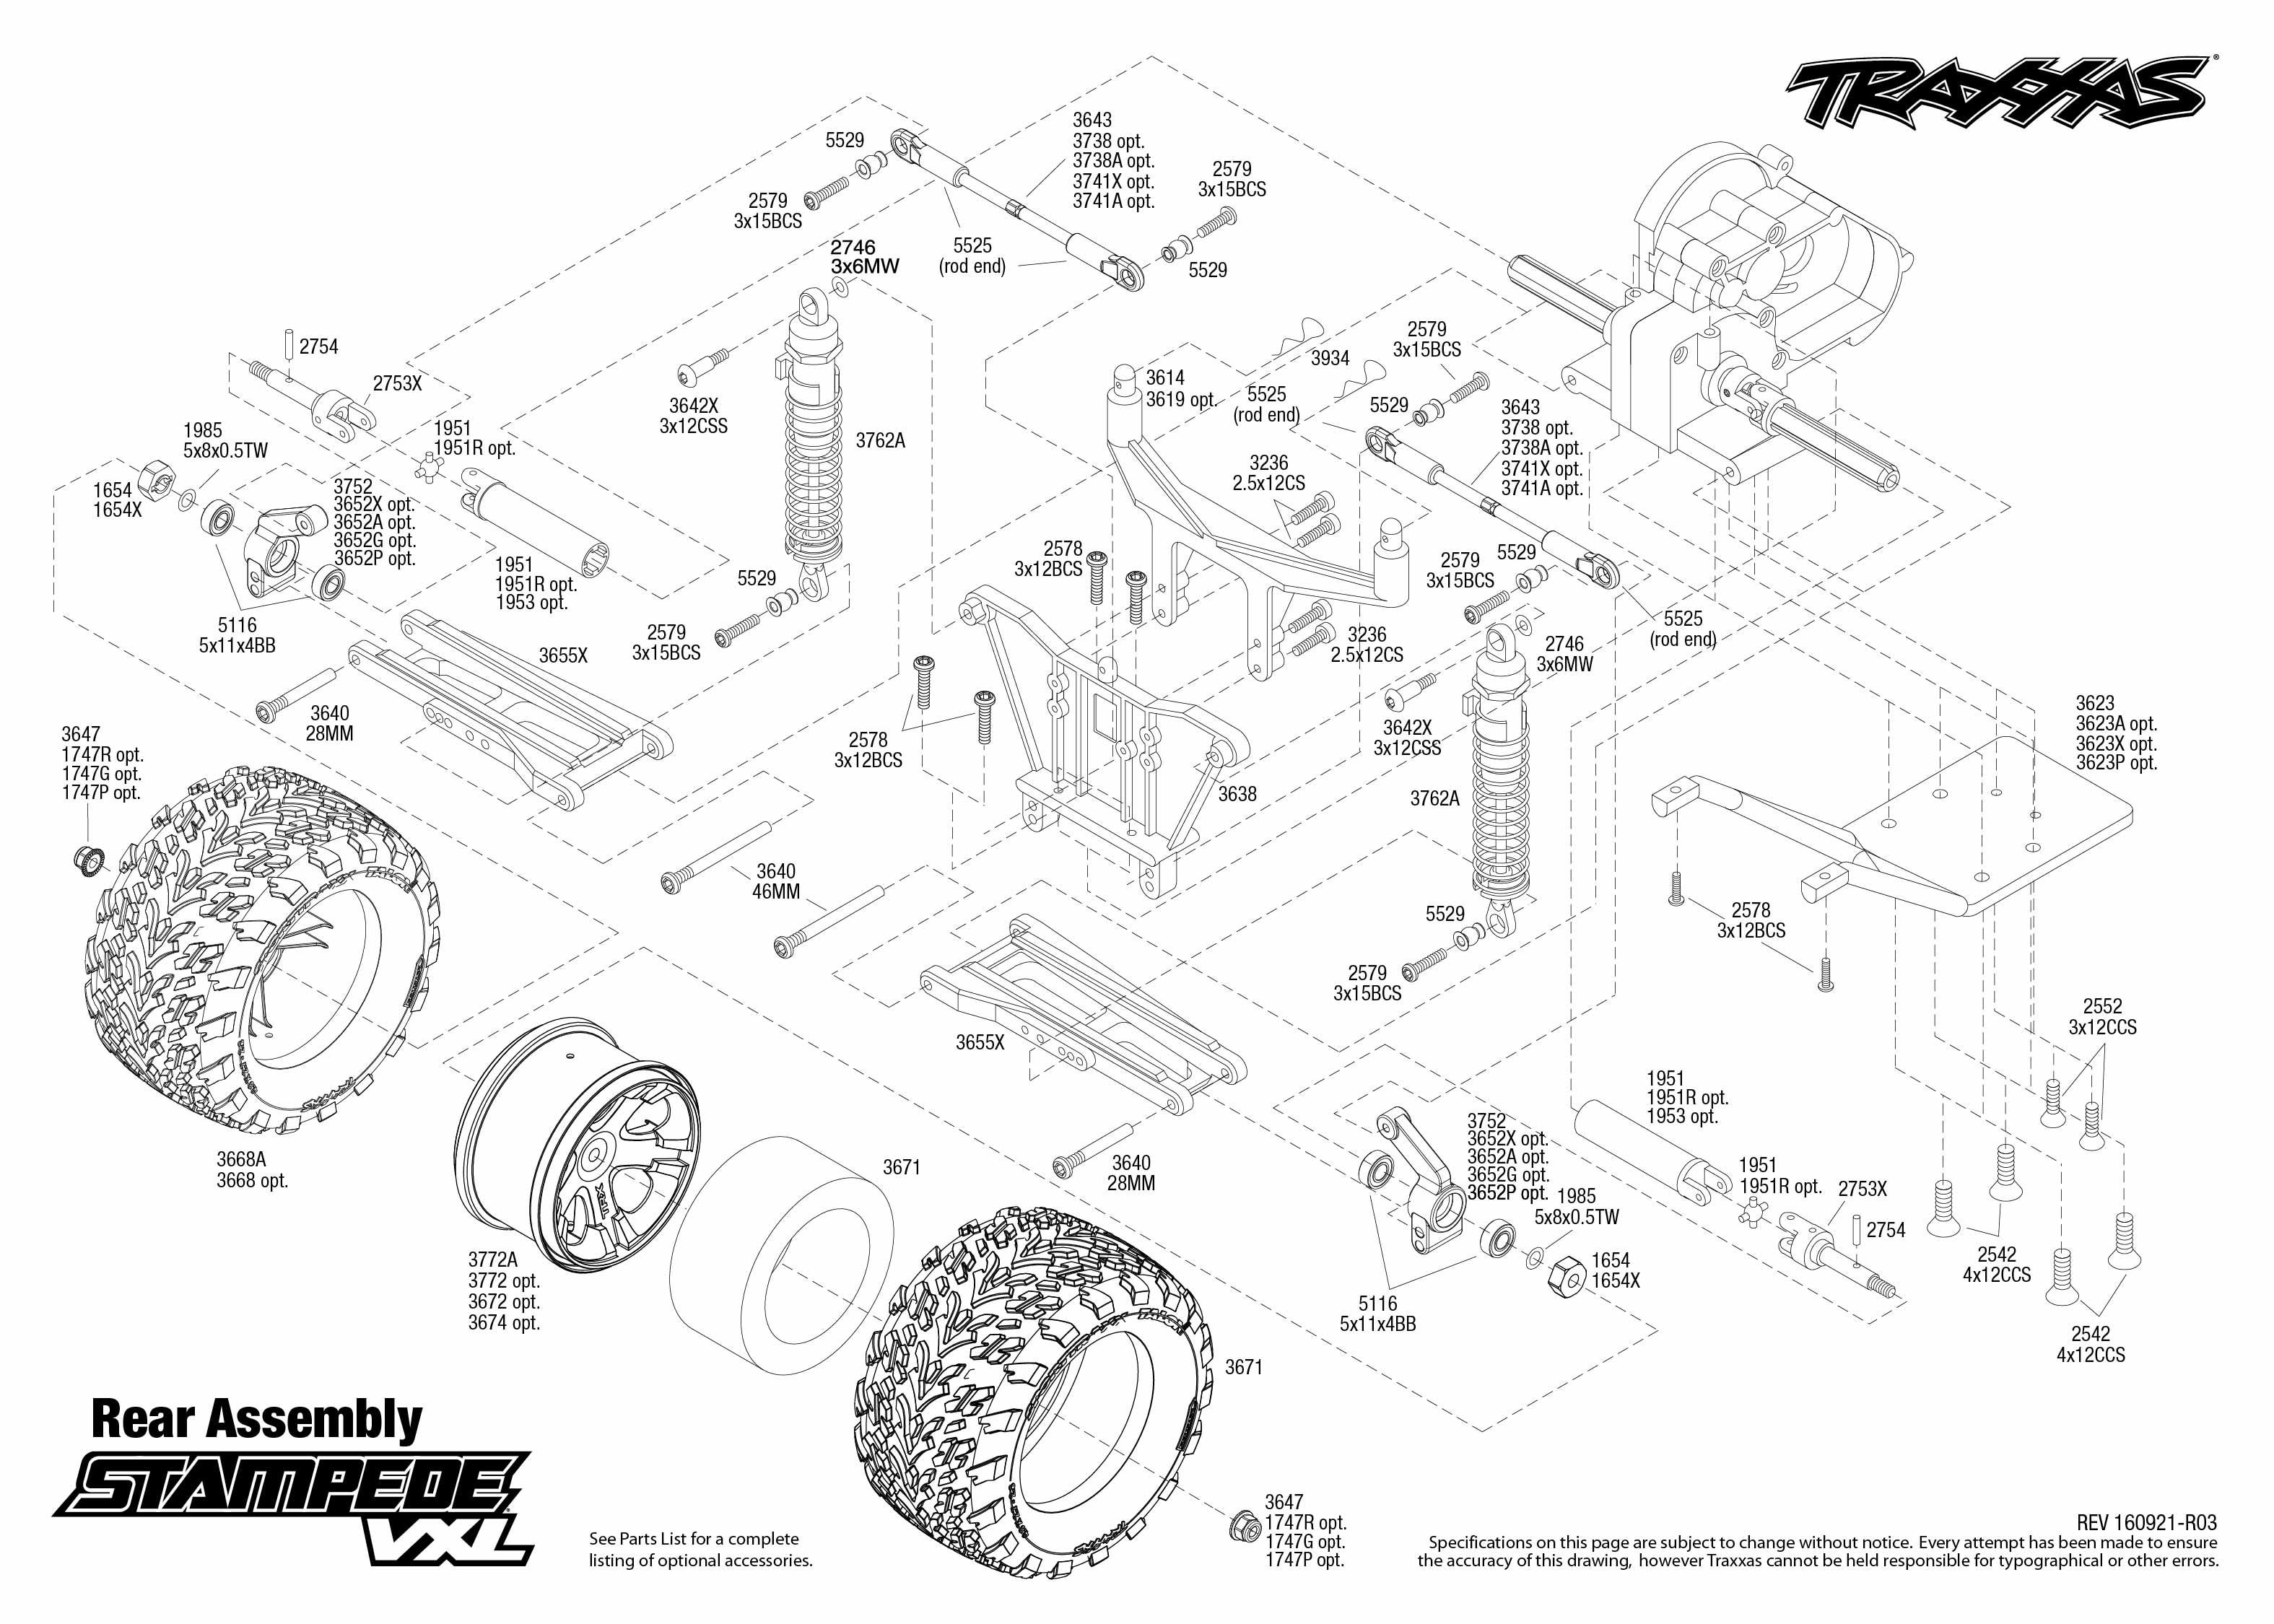 Fine Traxxas Bec Wiring Diagram Ideas Electrical Circuit Breathtaking Revo